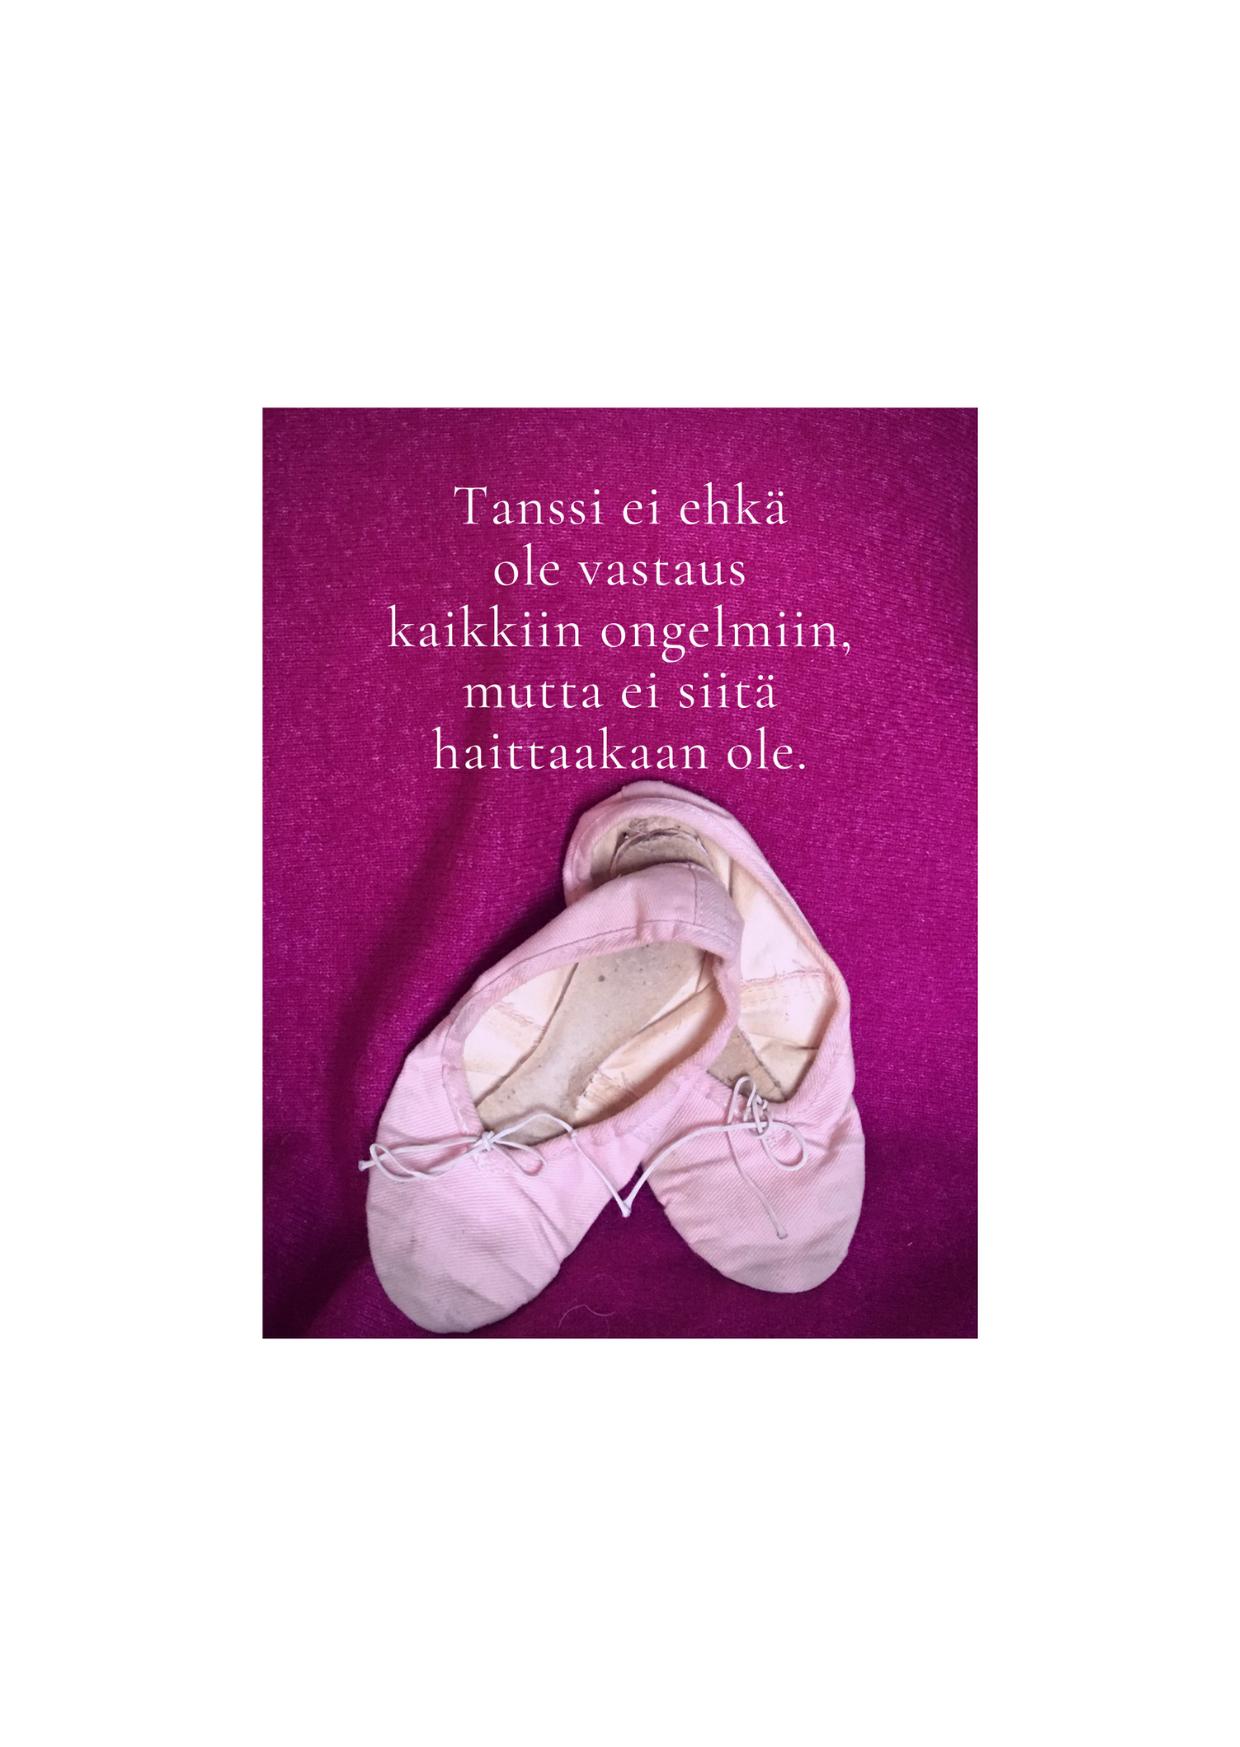 Balettitossut 014